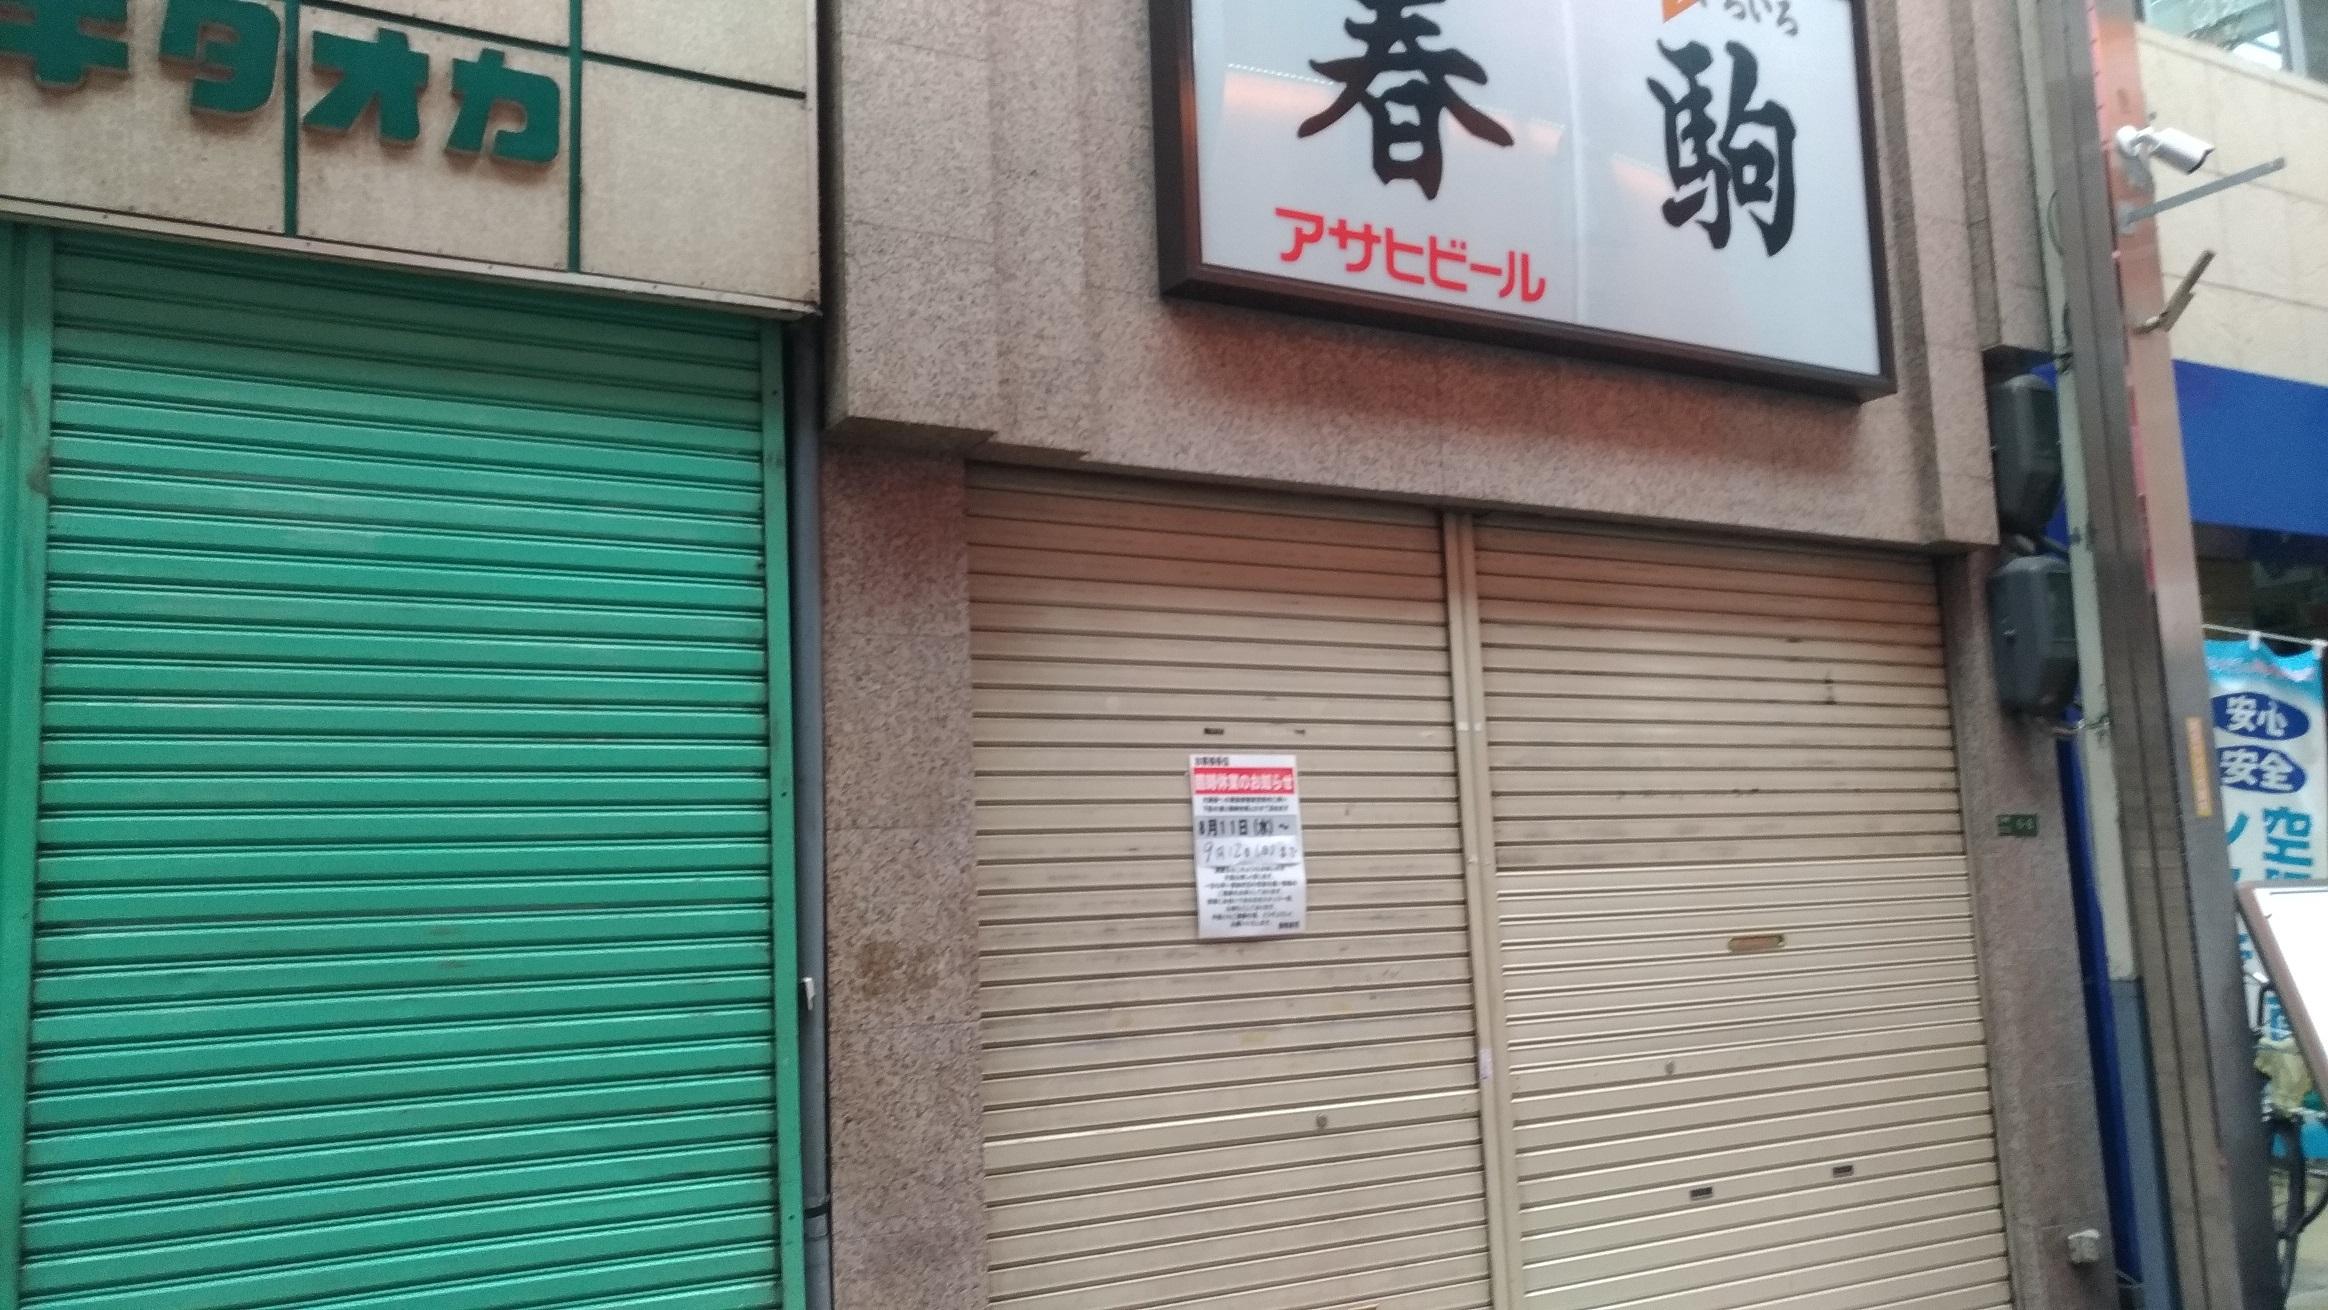 0osaka_sushi_2.jpg